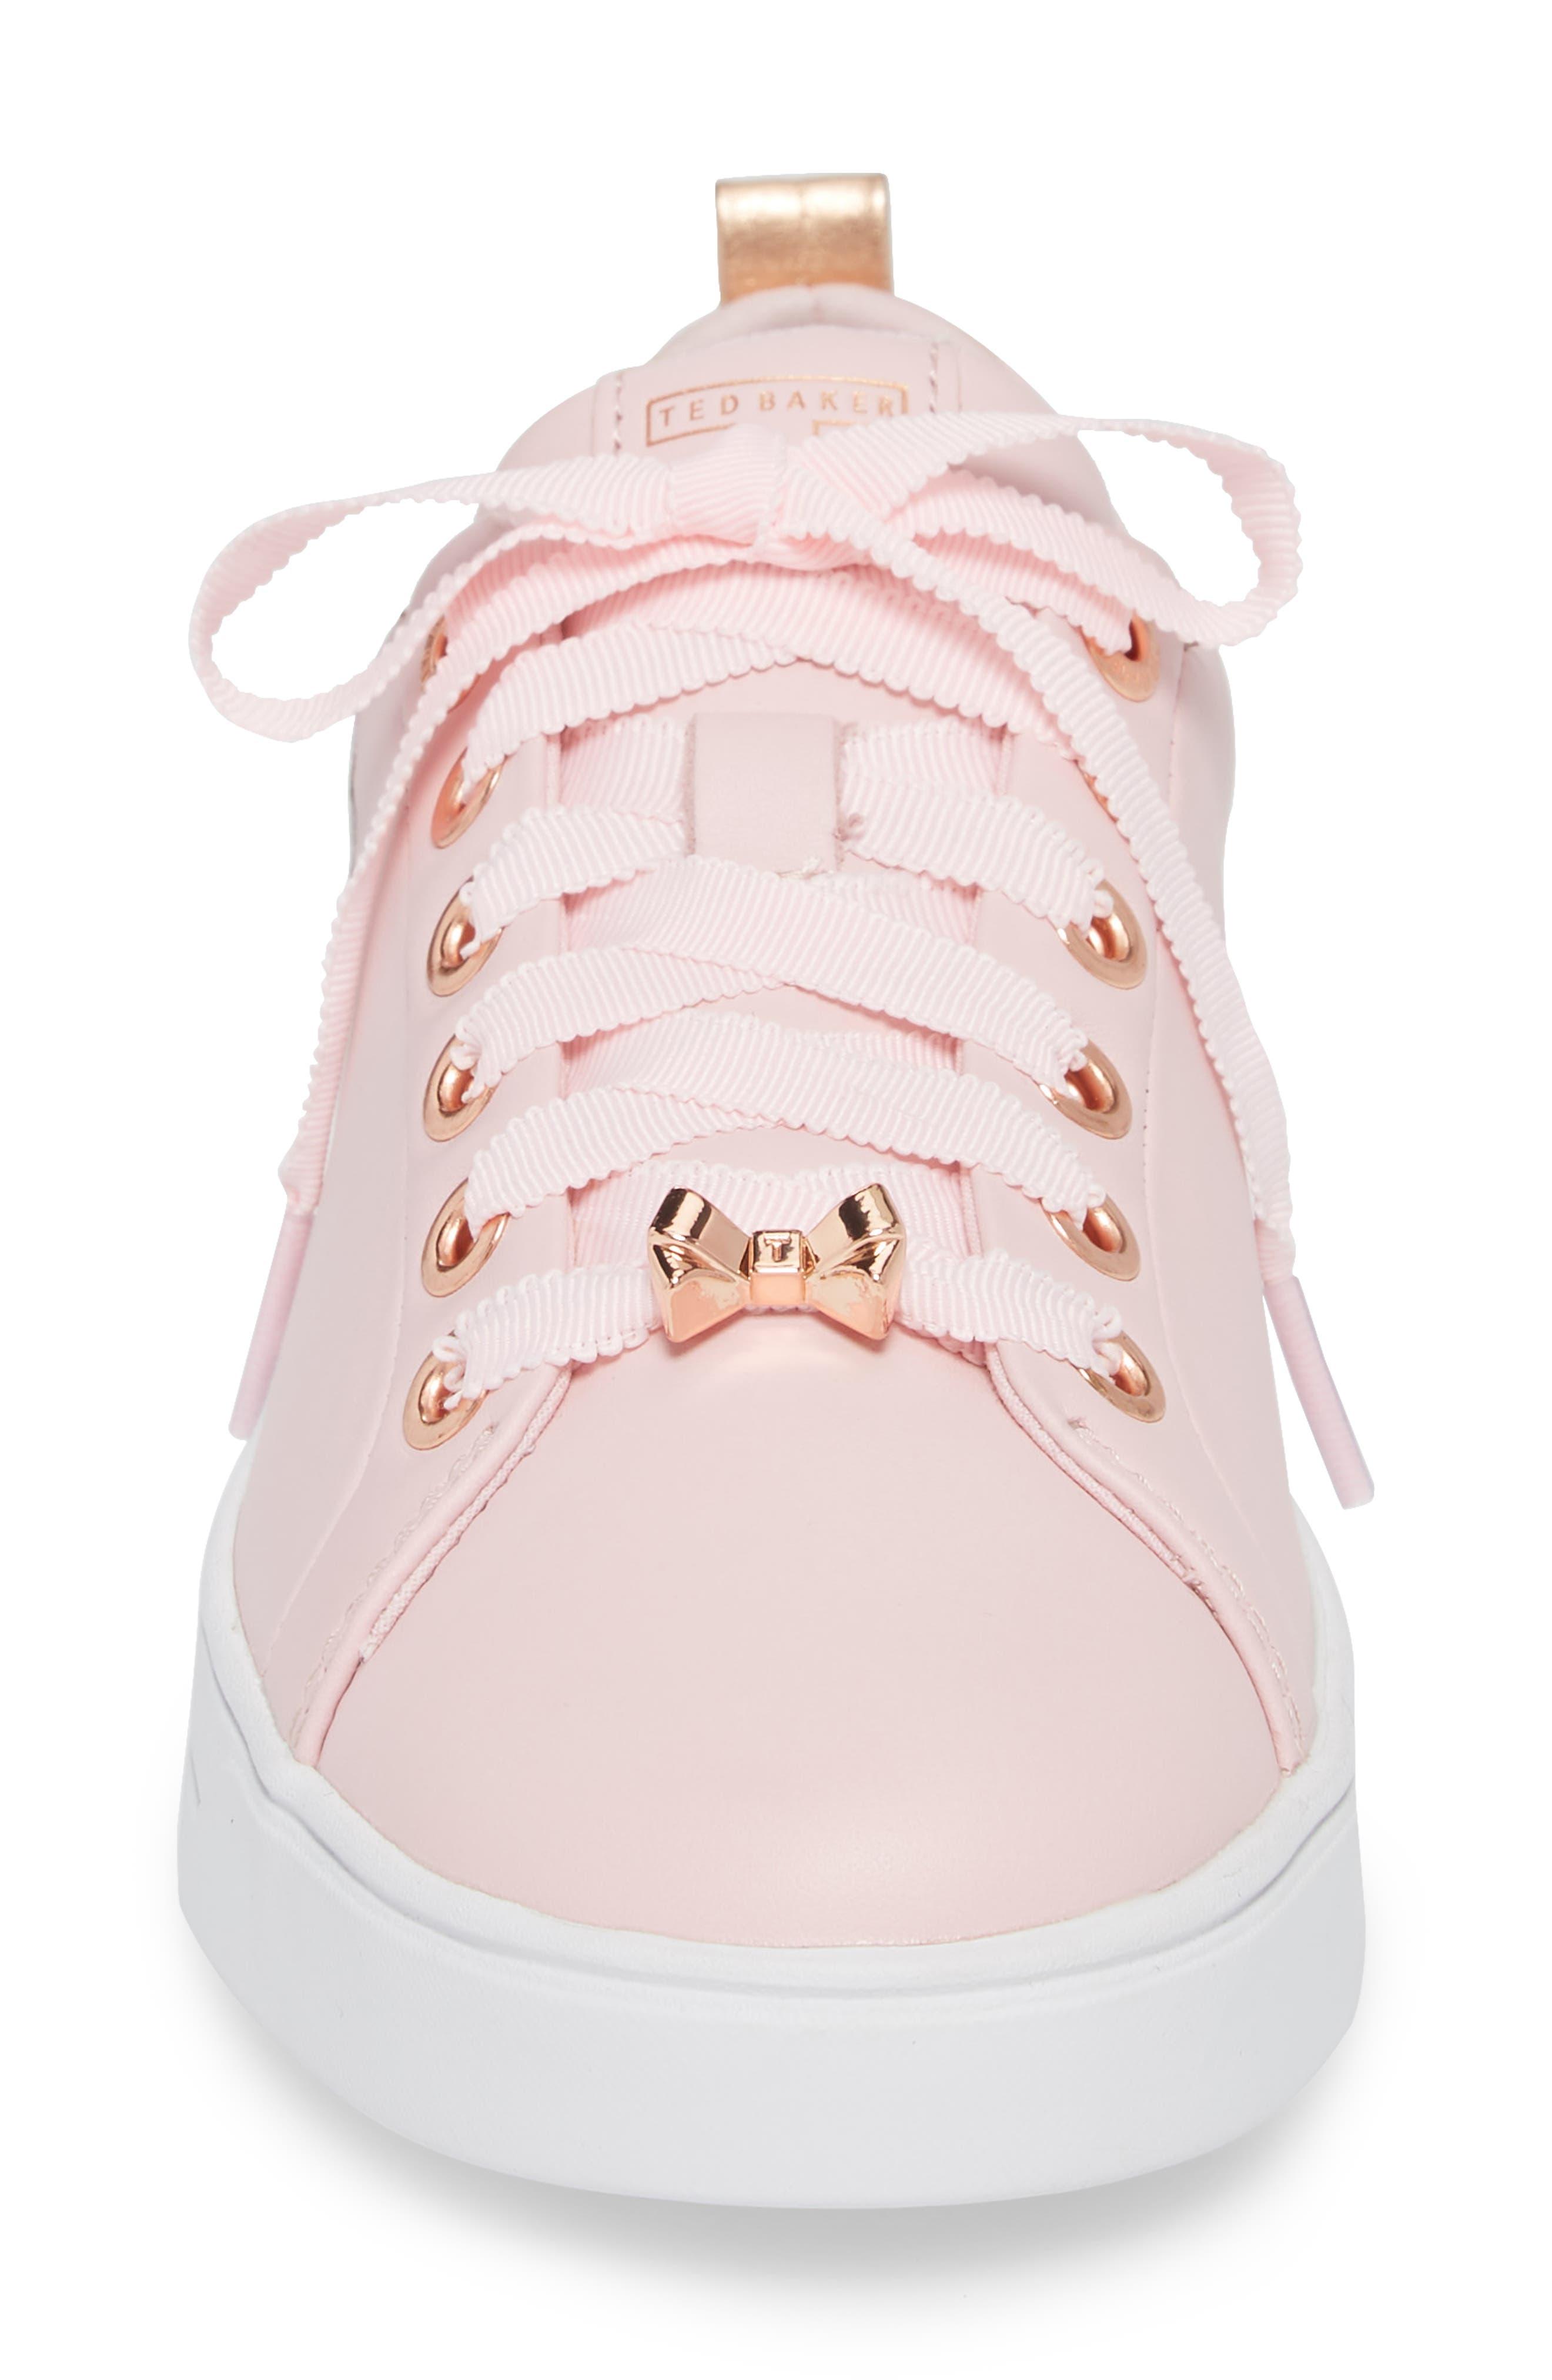 Kelleie Embroidered Sneaker,                             Alternate thumbnail 4, color,                             Mink Pink Leather